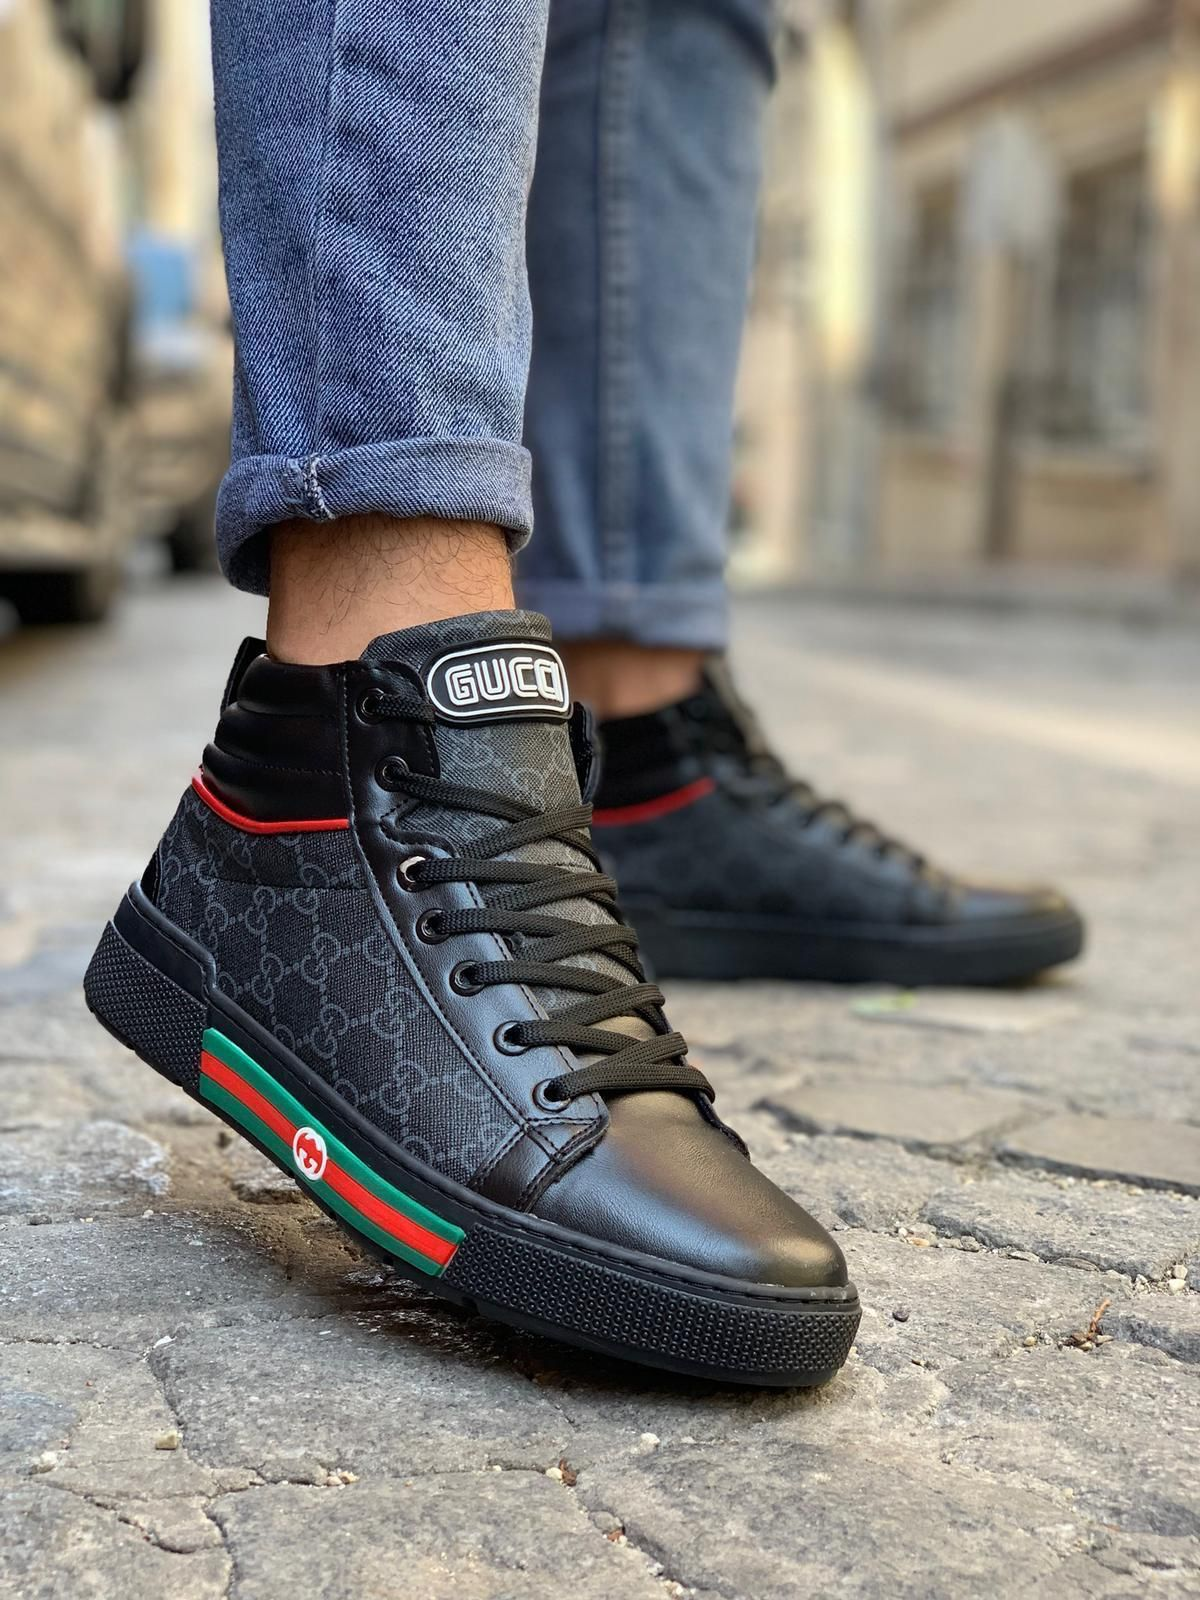 Gucci men shoes, Sneakers men fashion